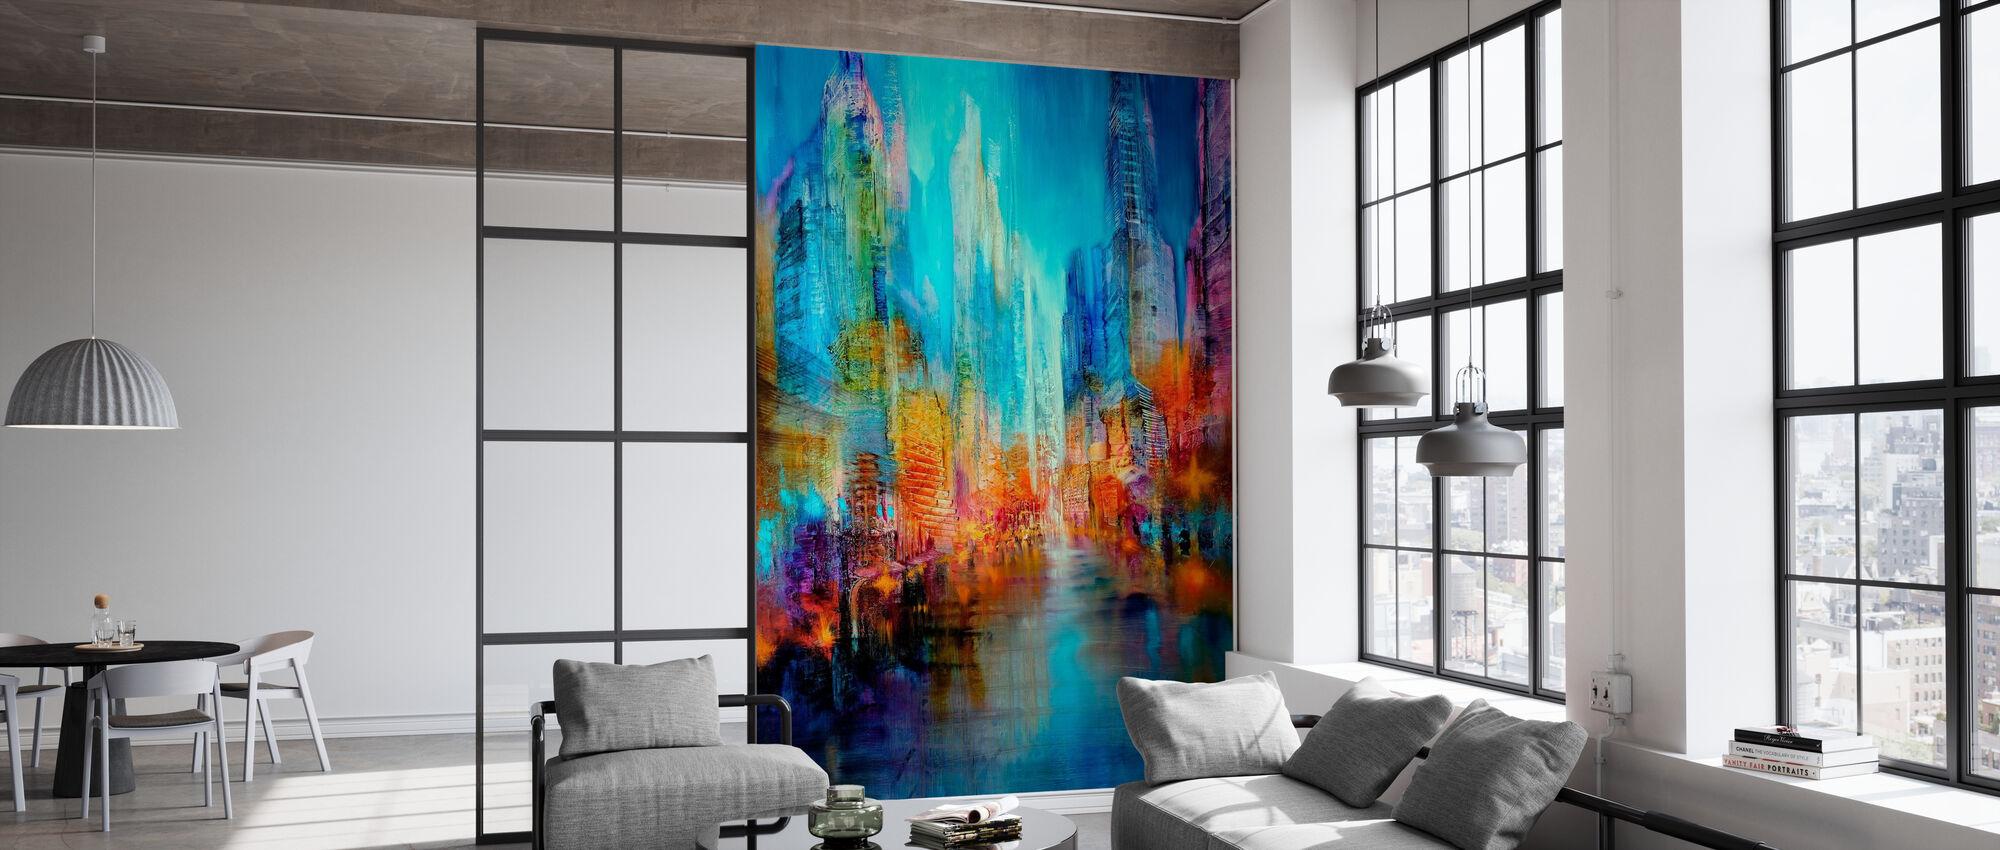 Big City - Wallpaper - Office